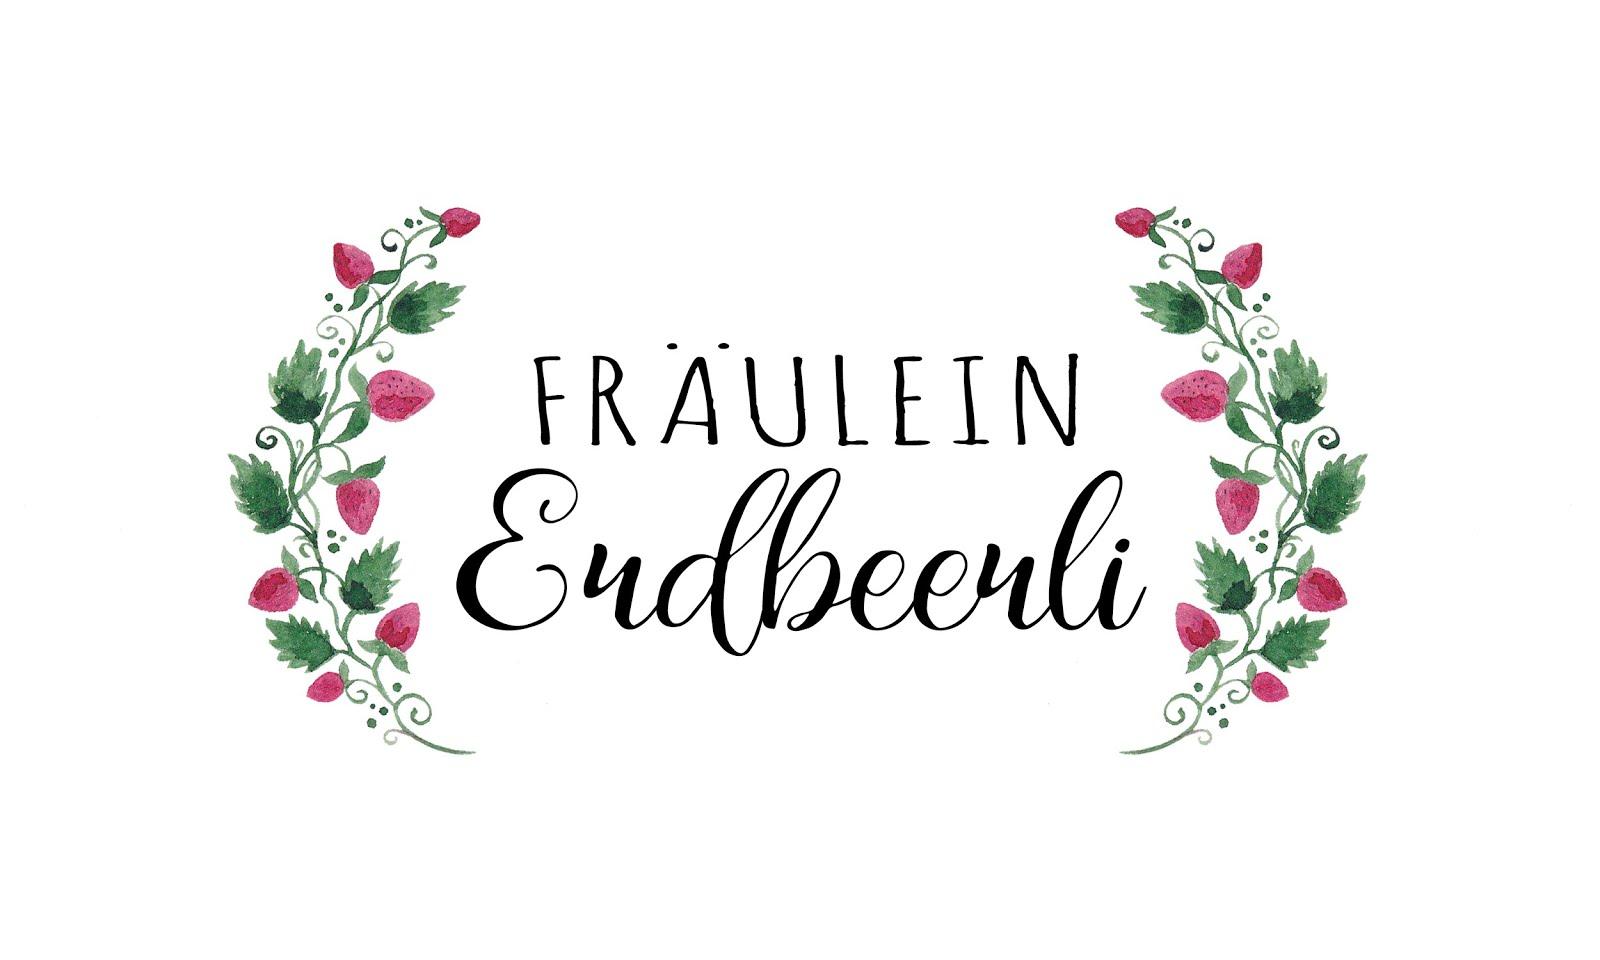 FRÄULEIN Erdbeerli